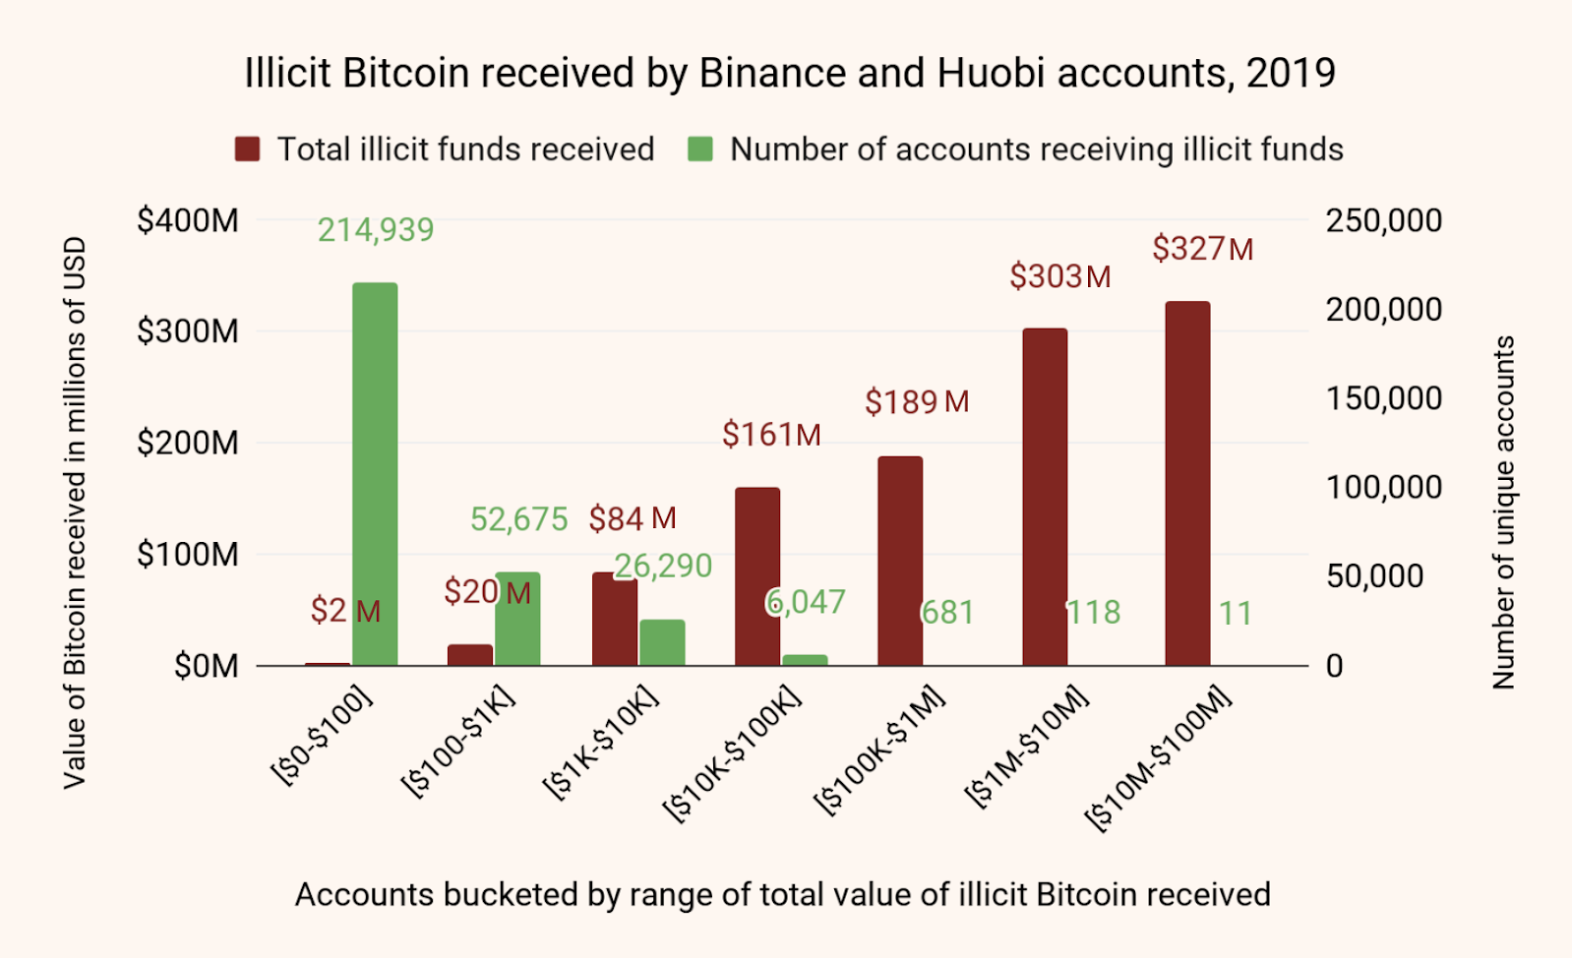 Chainalysis เผย อาชญากรส่ง Bitcoin ราว $2.8 พันล้านดอลลาร์ ผ่านตลาด Exchange ชื่อดัง